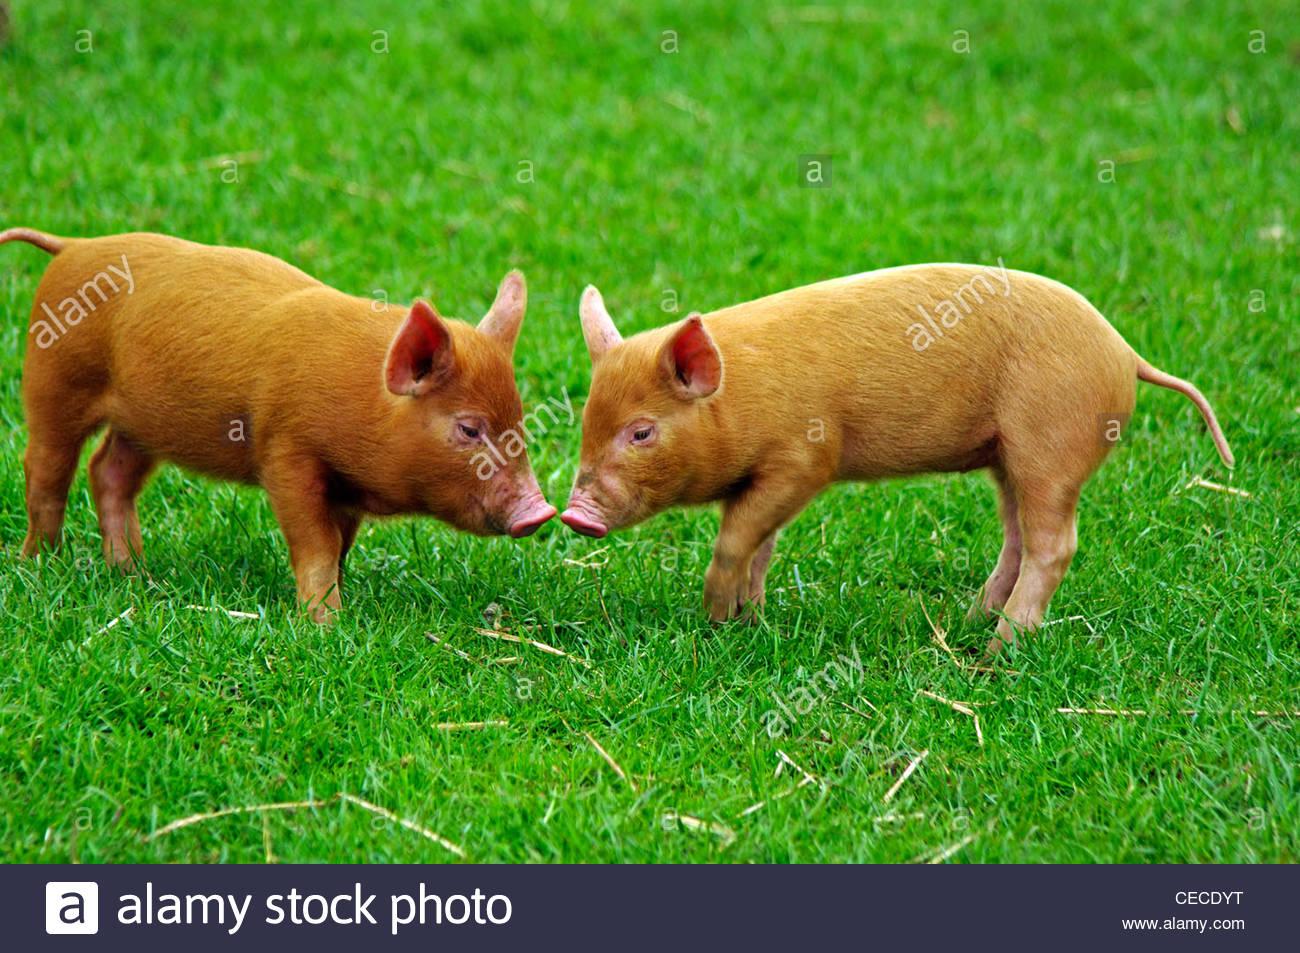 Iron Age Piglets Cotswold Farm Park England - Stock Image